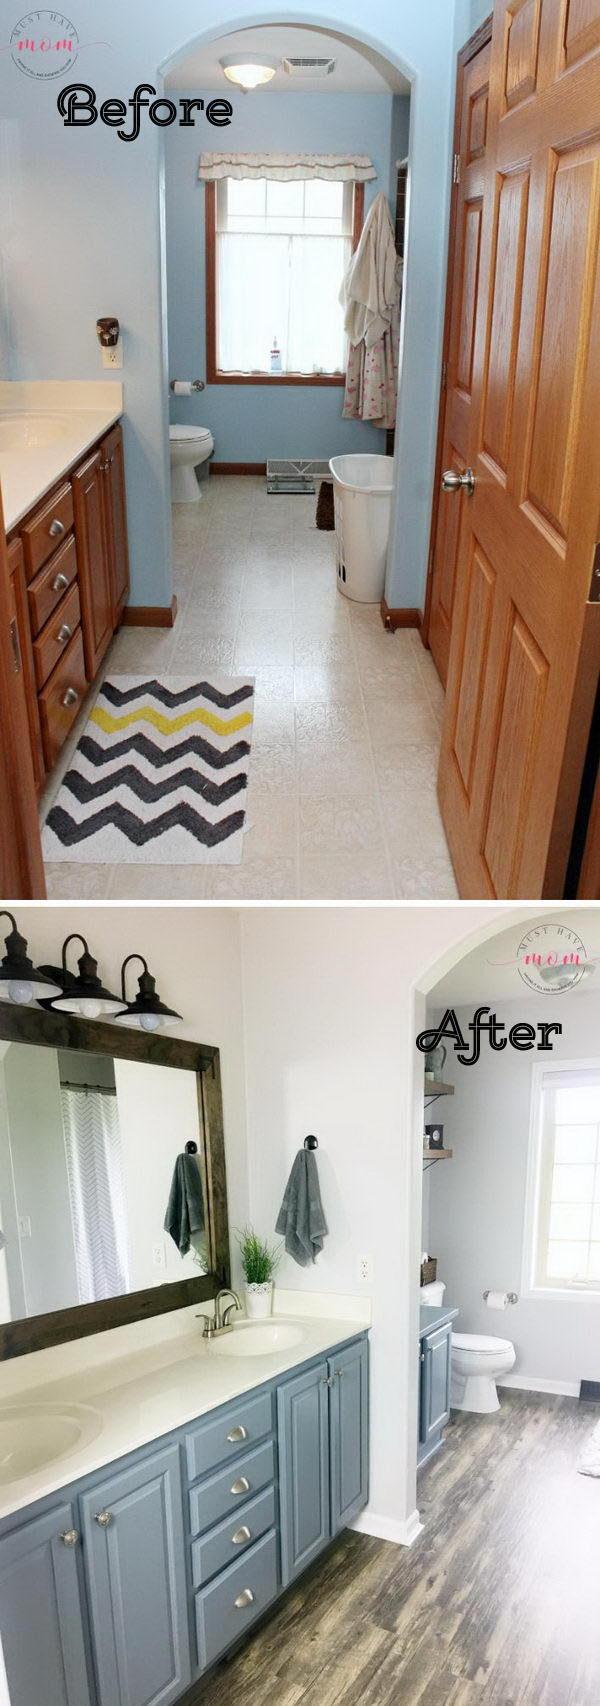 DIY Farmhouse Style Fixer Upper Bathroom On A Budget.